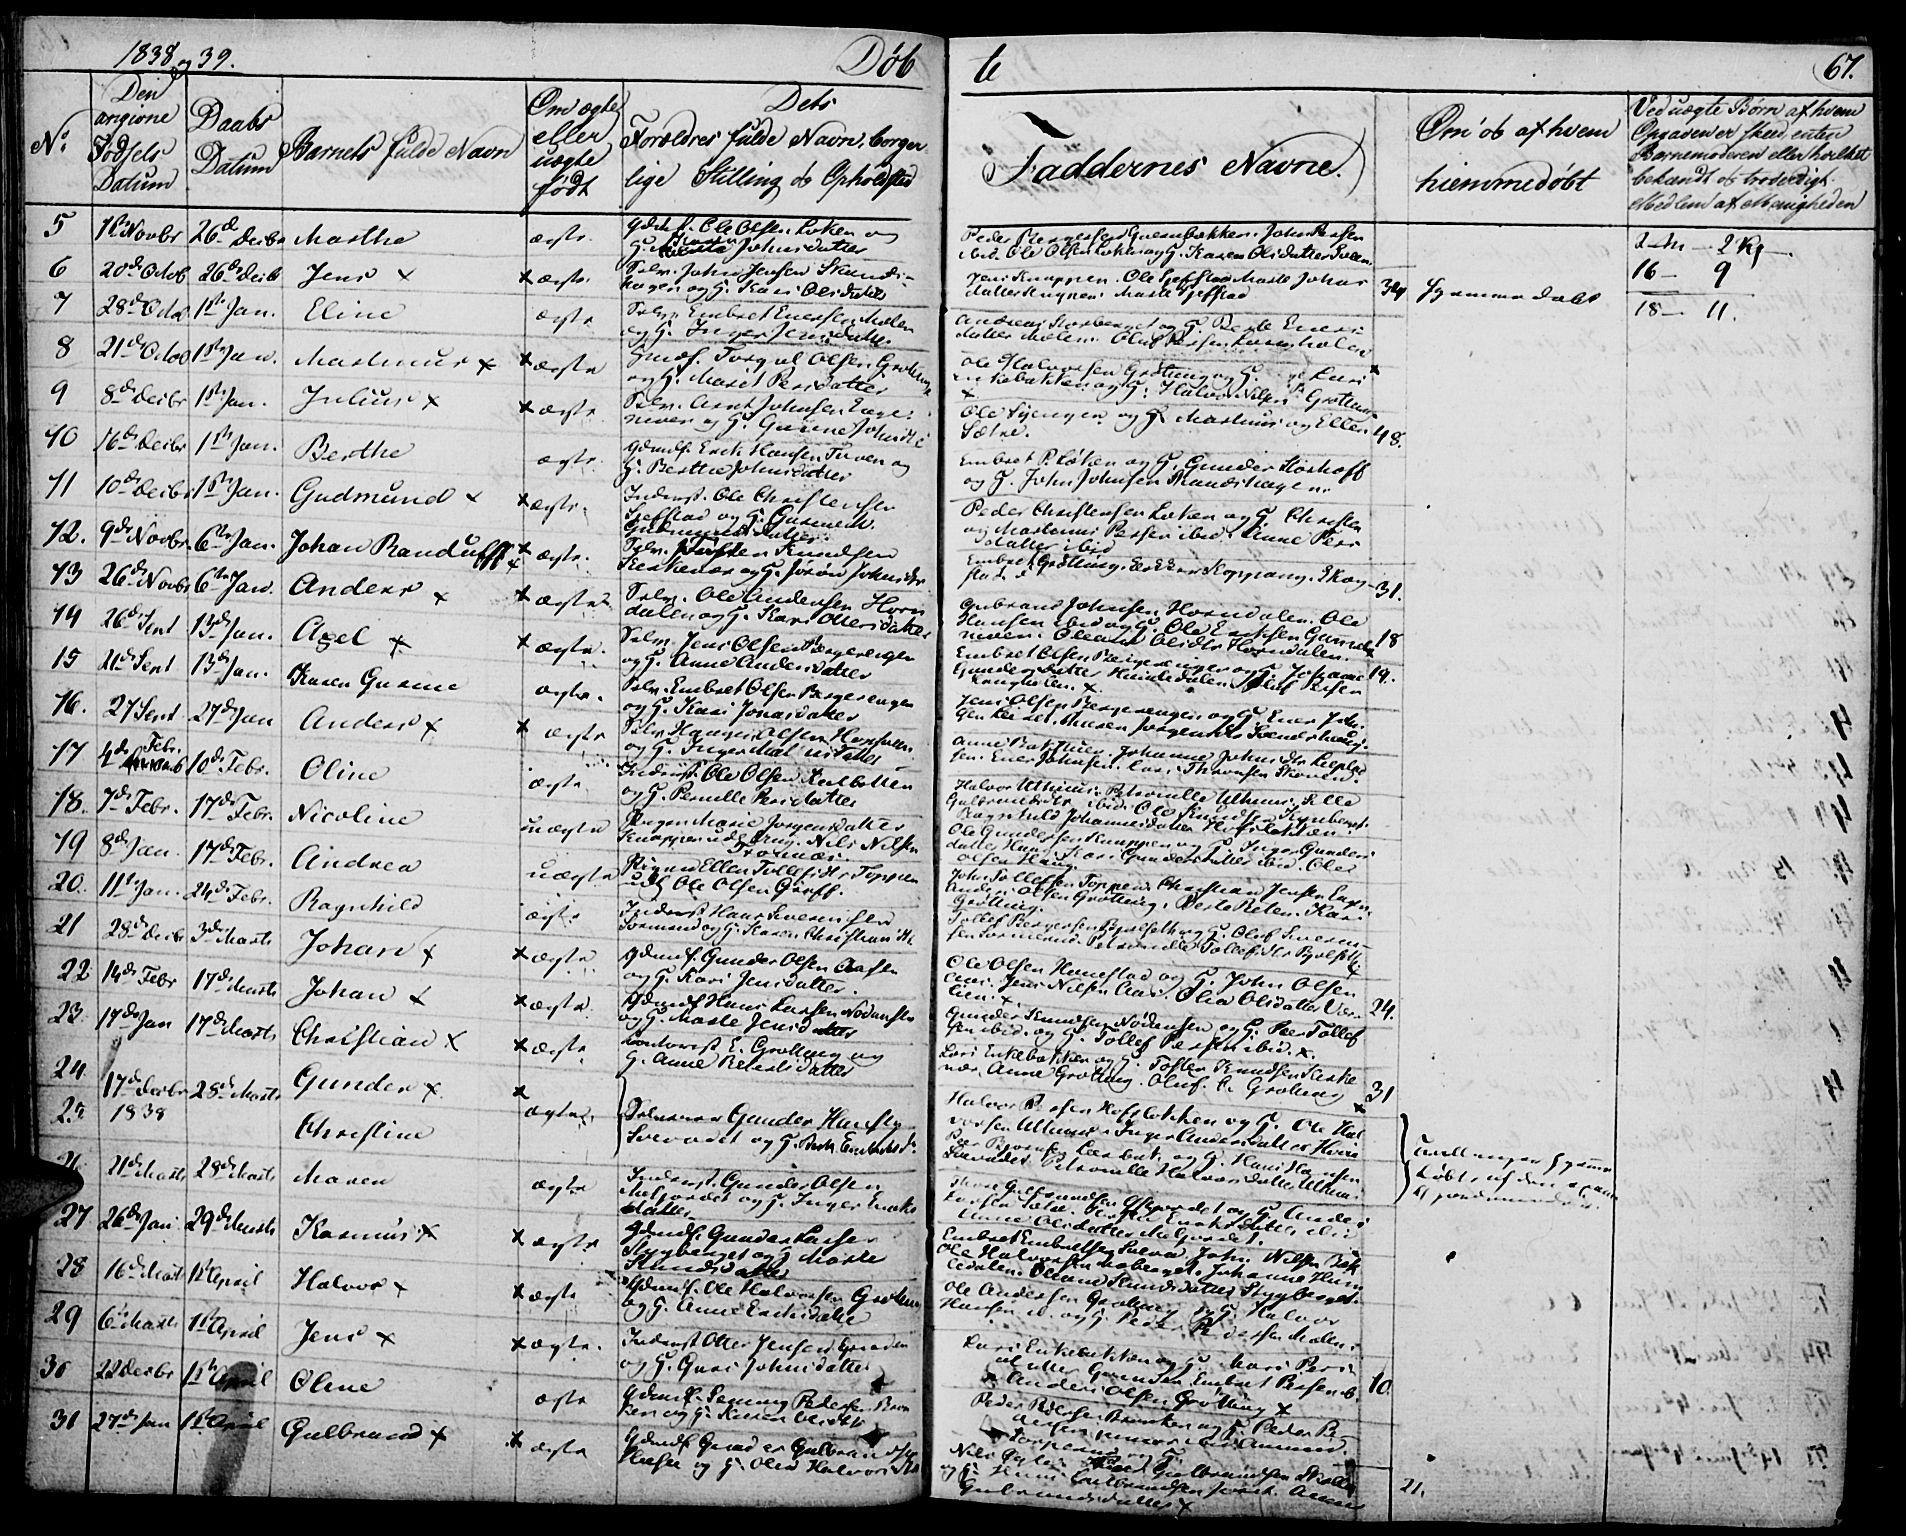 SAH, Elverum prestekontor, H/Ha/Haa/L0008: Ministerialbok nr. 8, 1830-1842, s. 67